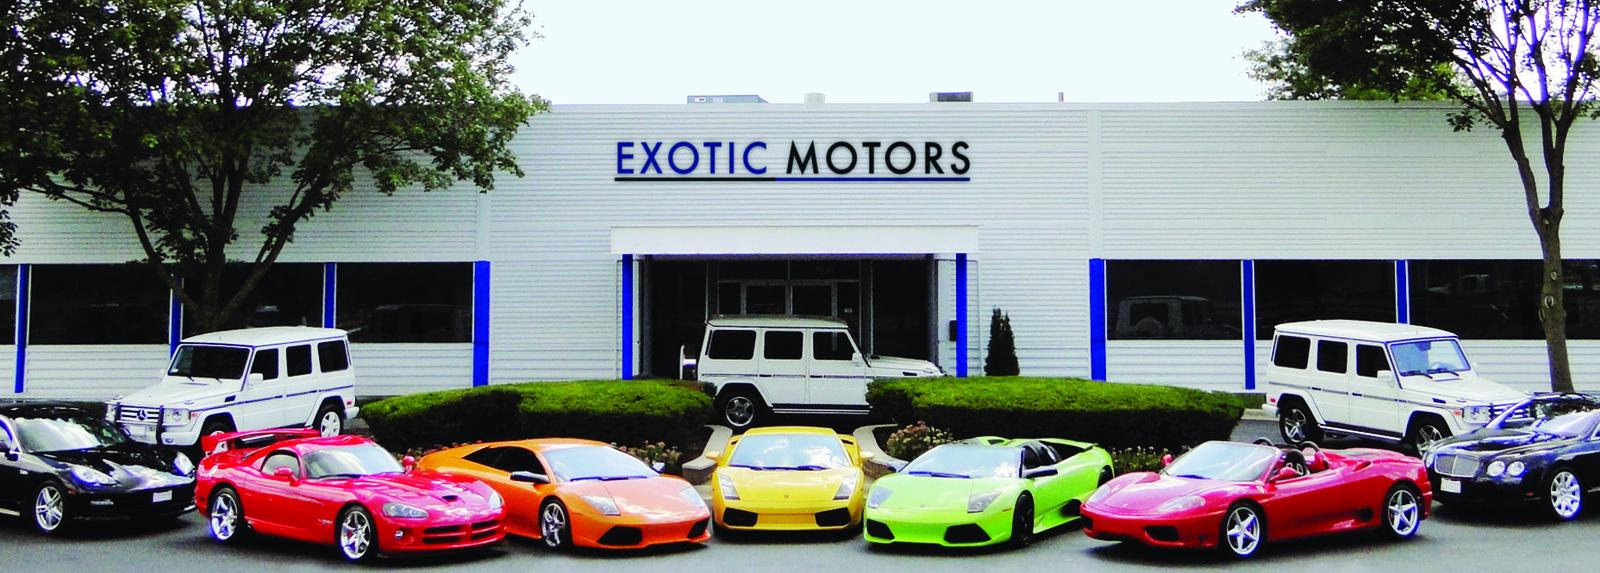 Exotic Motors - Rolling Meadows, IL: Read Consumer reviews ...